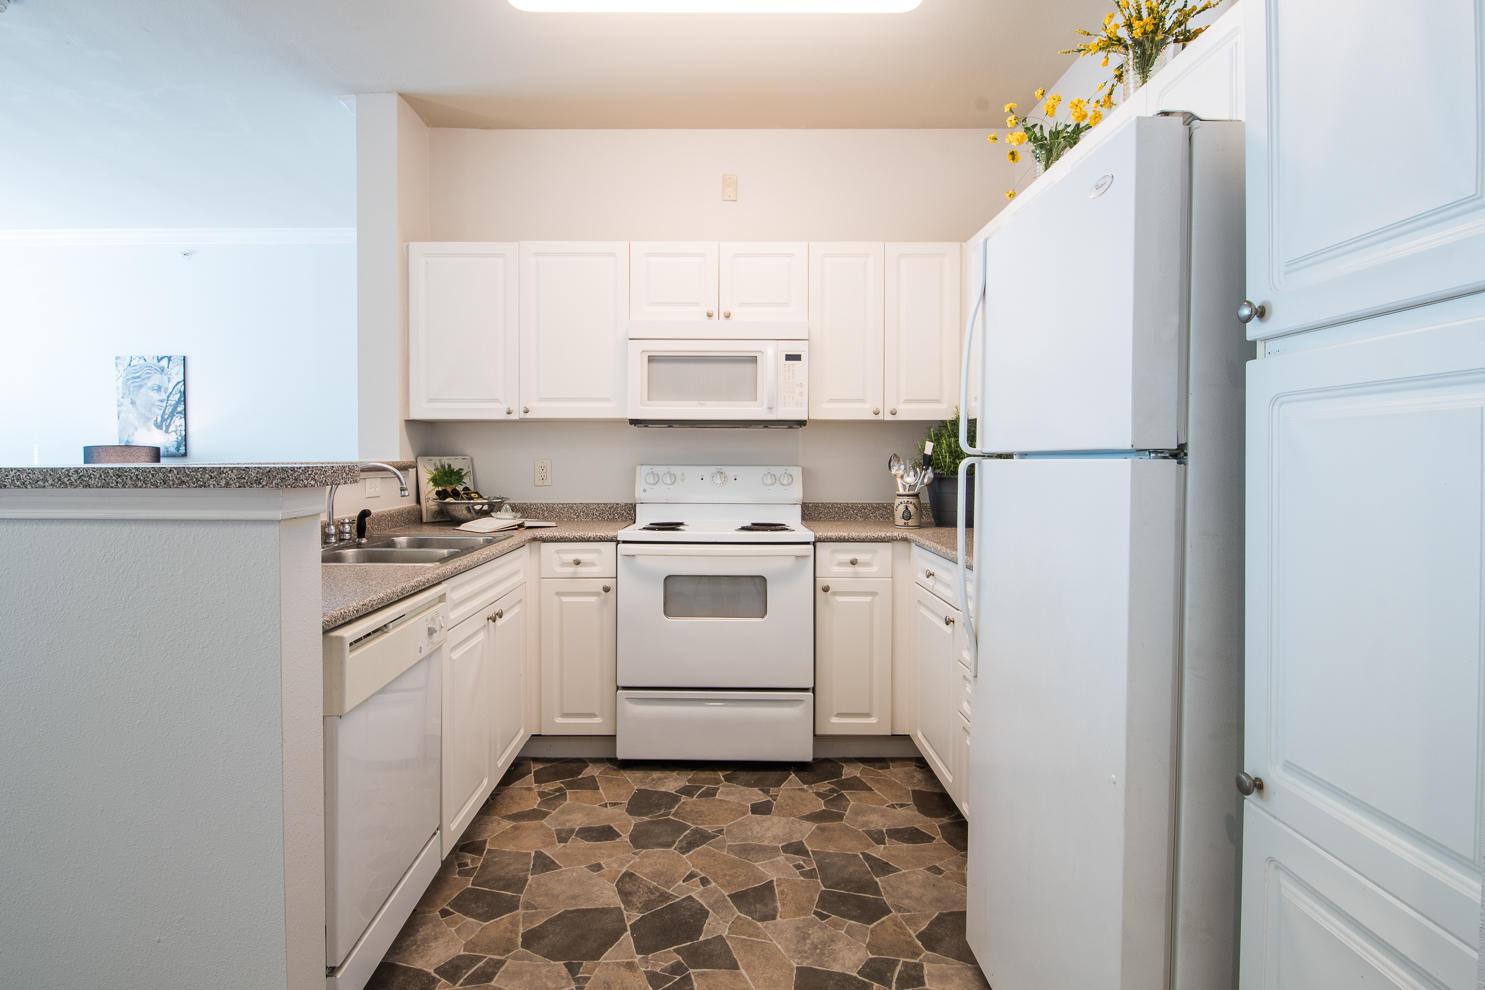 Daniel Landing Condos Homes For Sale - 130 River Landing, Charleston, SC - 20